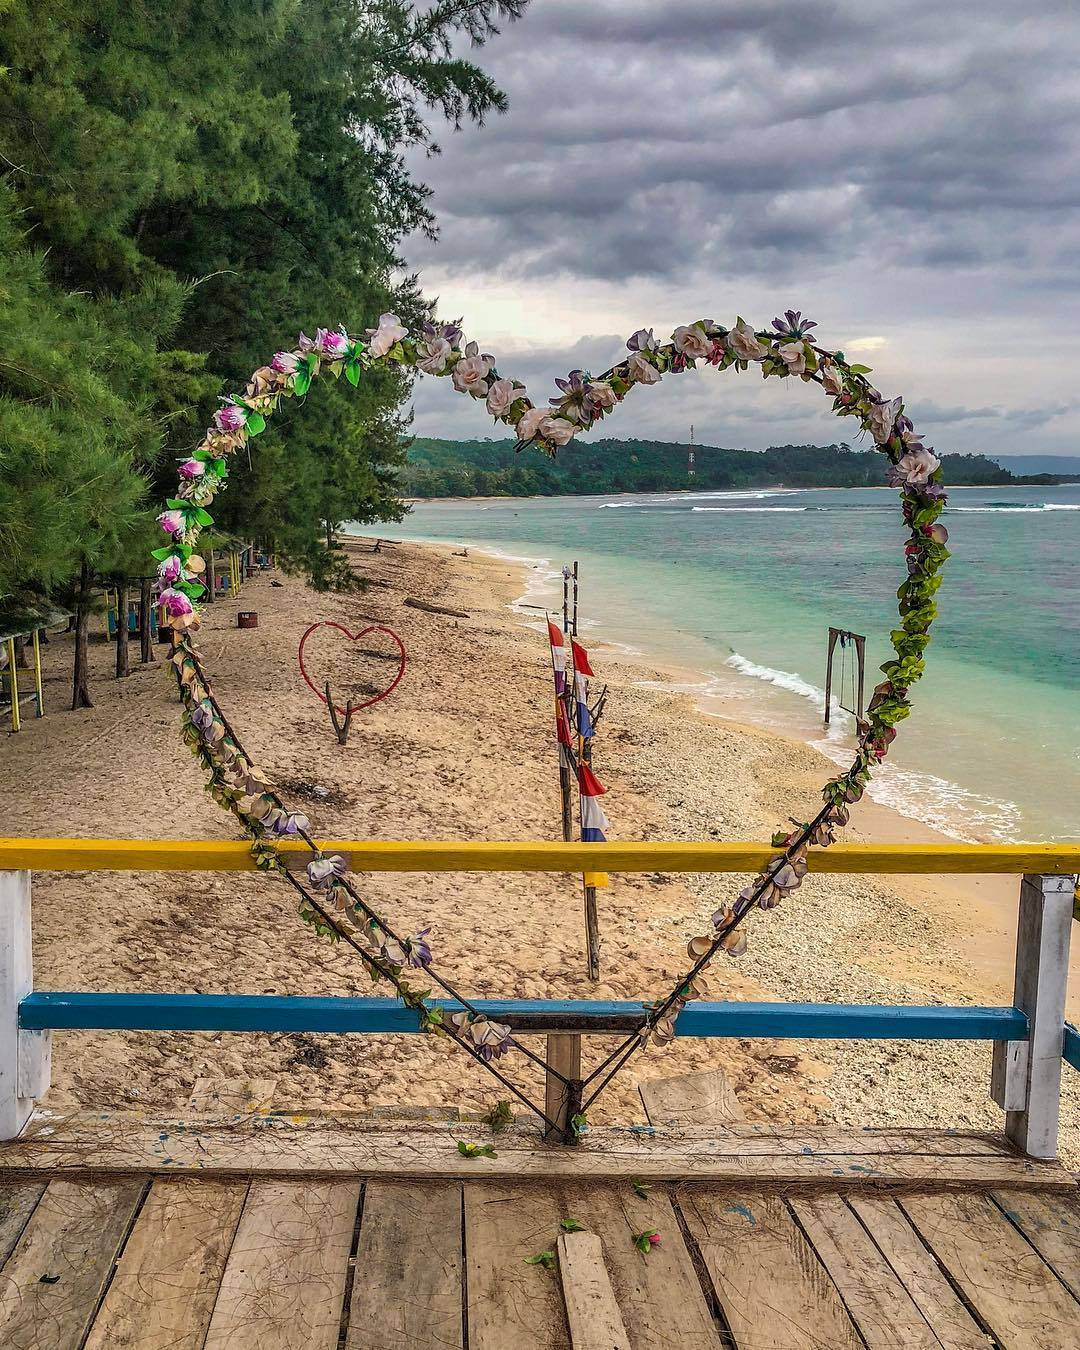 Penginapan Di Pantai Laguna Bengkulu : penginapan, pantai, laguna, bengkulu, Pantai, Laguna,, Pesona, Bahari, Indah, Bengkulu